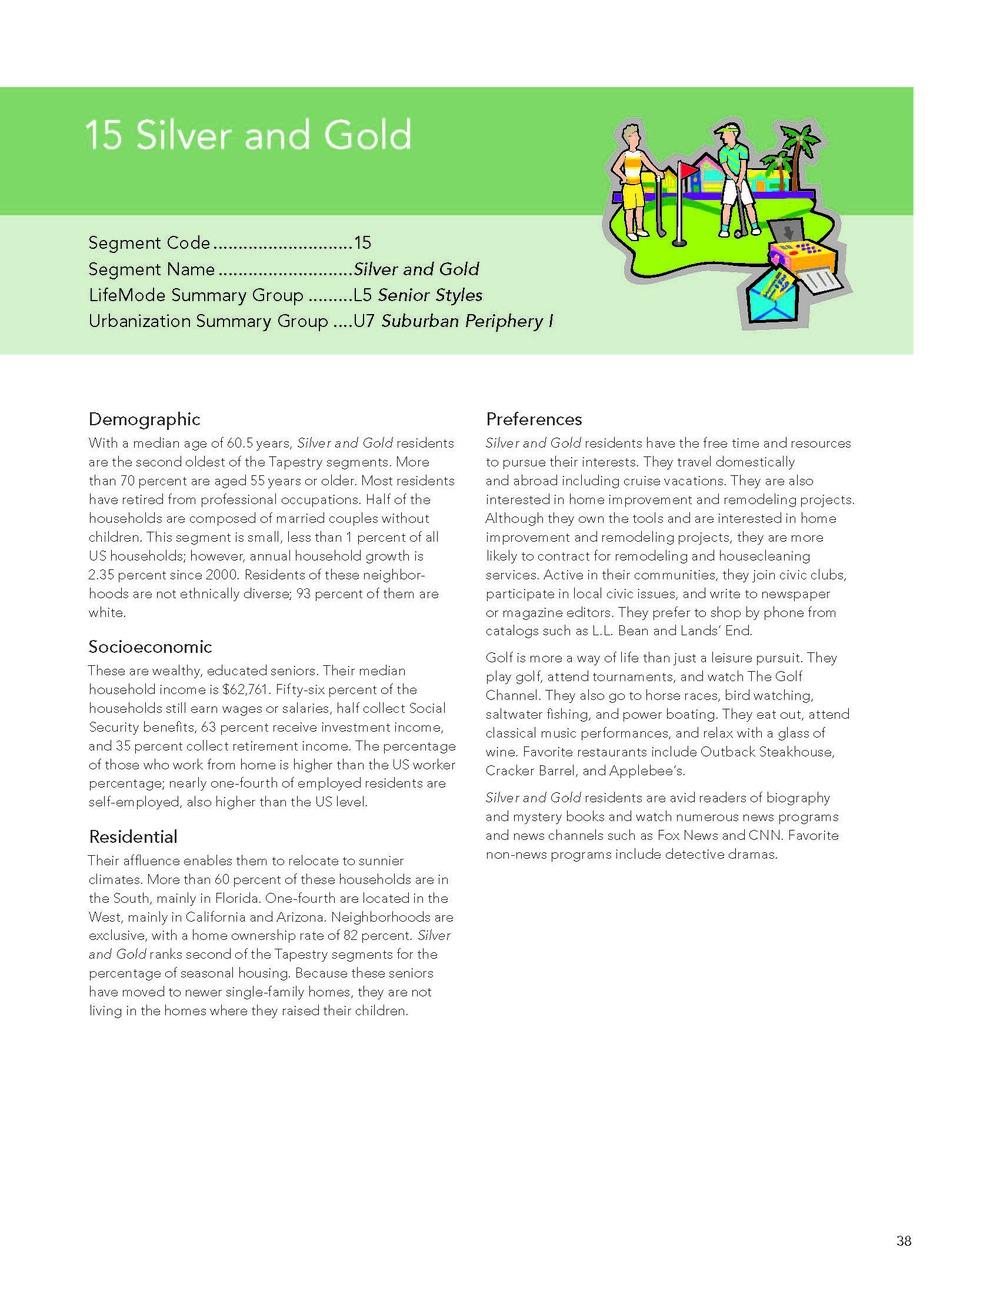 tapestry-segmentation_Page_41.jpg